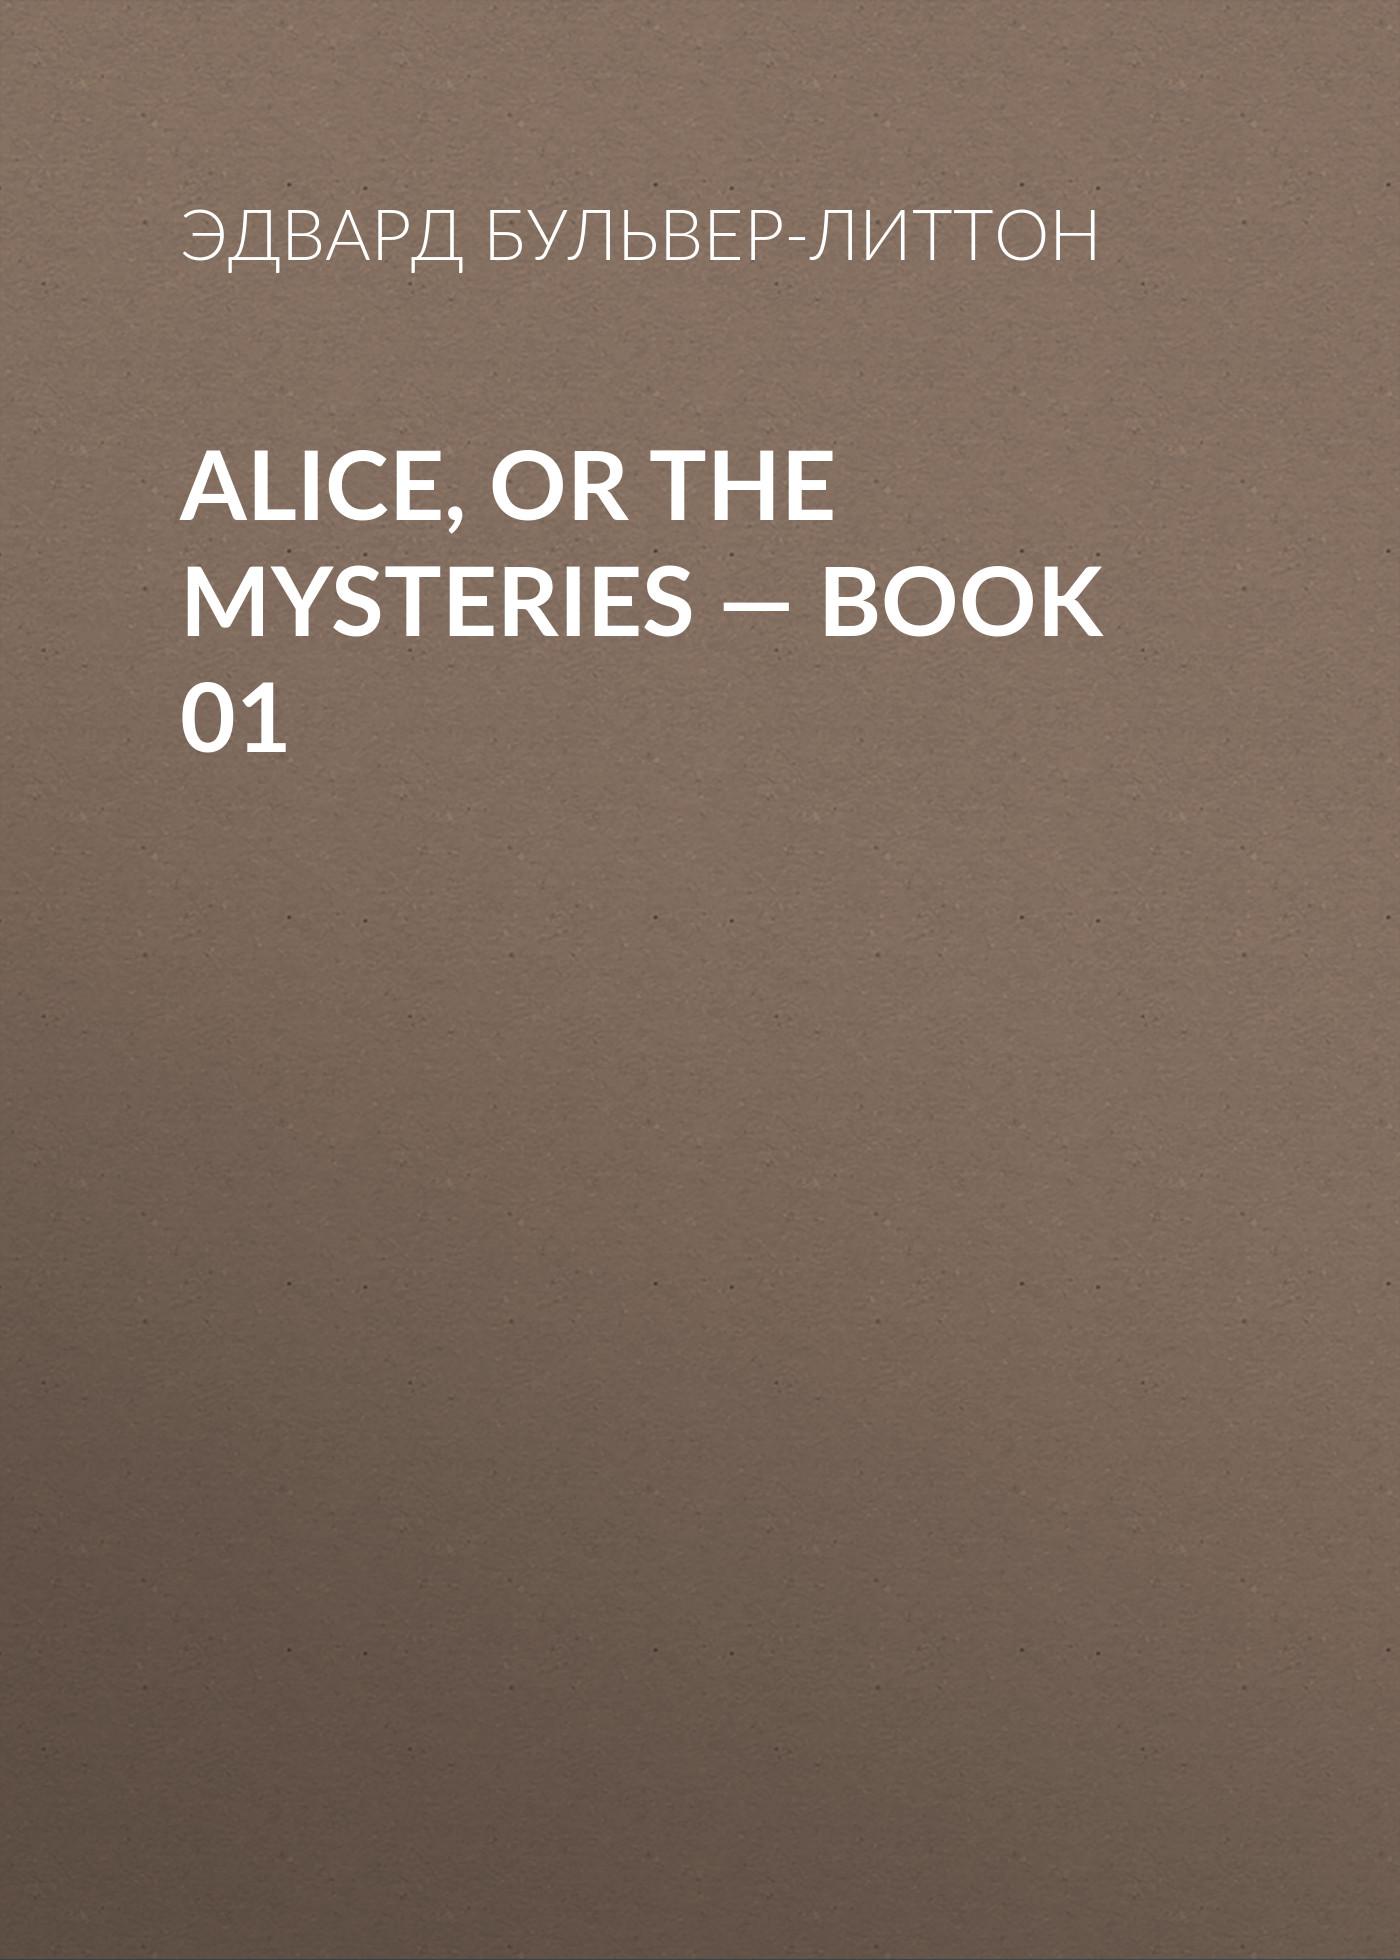 Эдвард Бульвер-Литтон Alice, or the Mysteries — Book 01